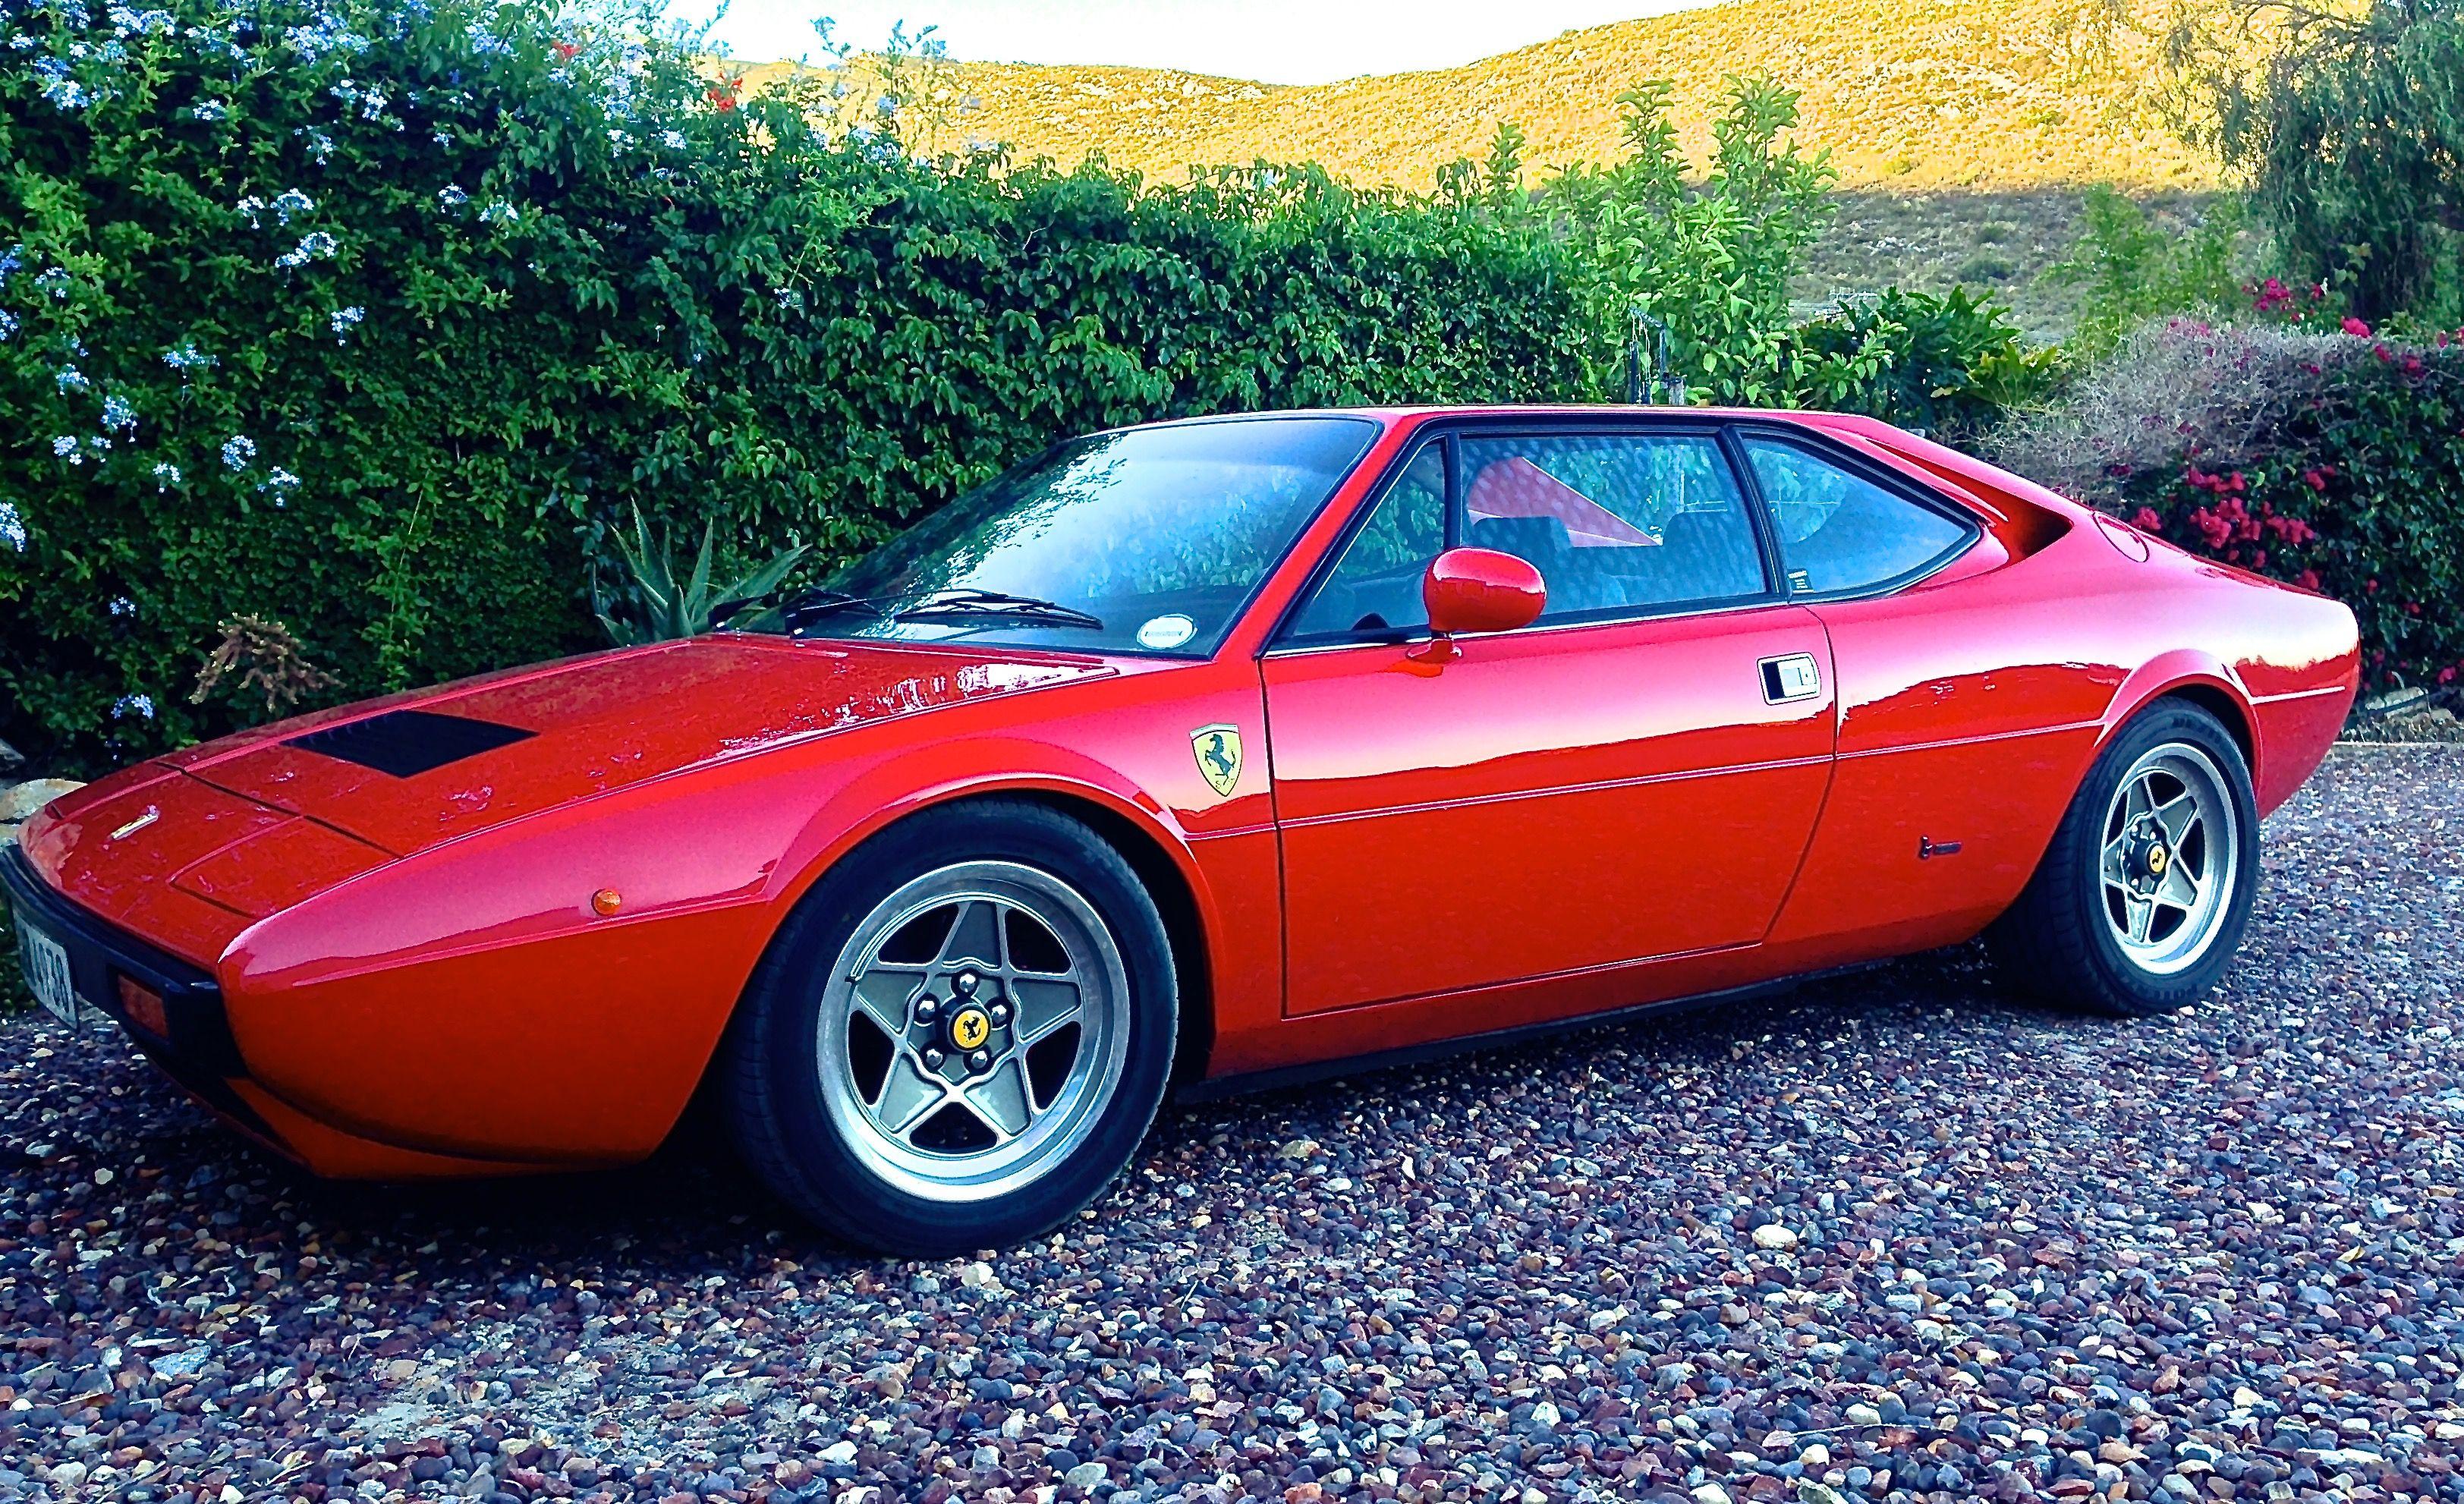 a6ffdb1c862767a6c4f238b8817f7a45 Outstanding Ferrari Mondial 8 Sale south Africa Cars Trend